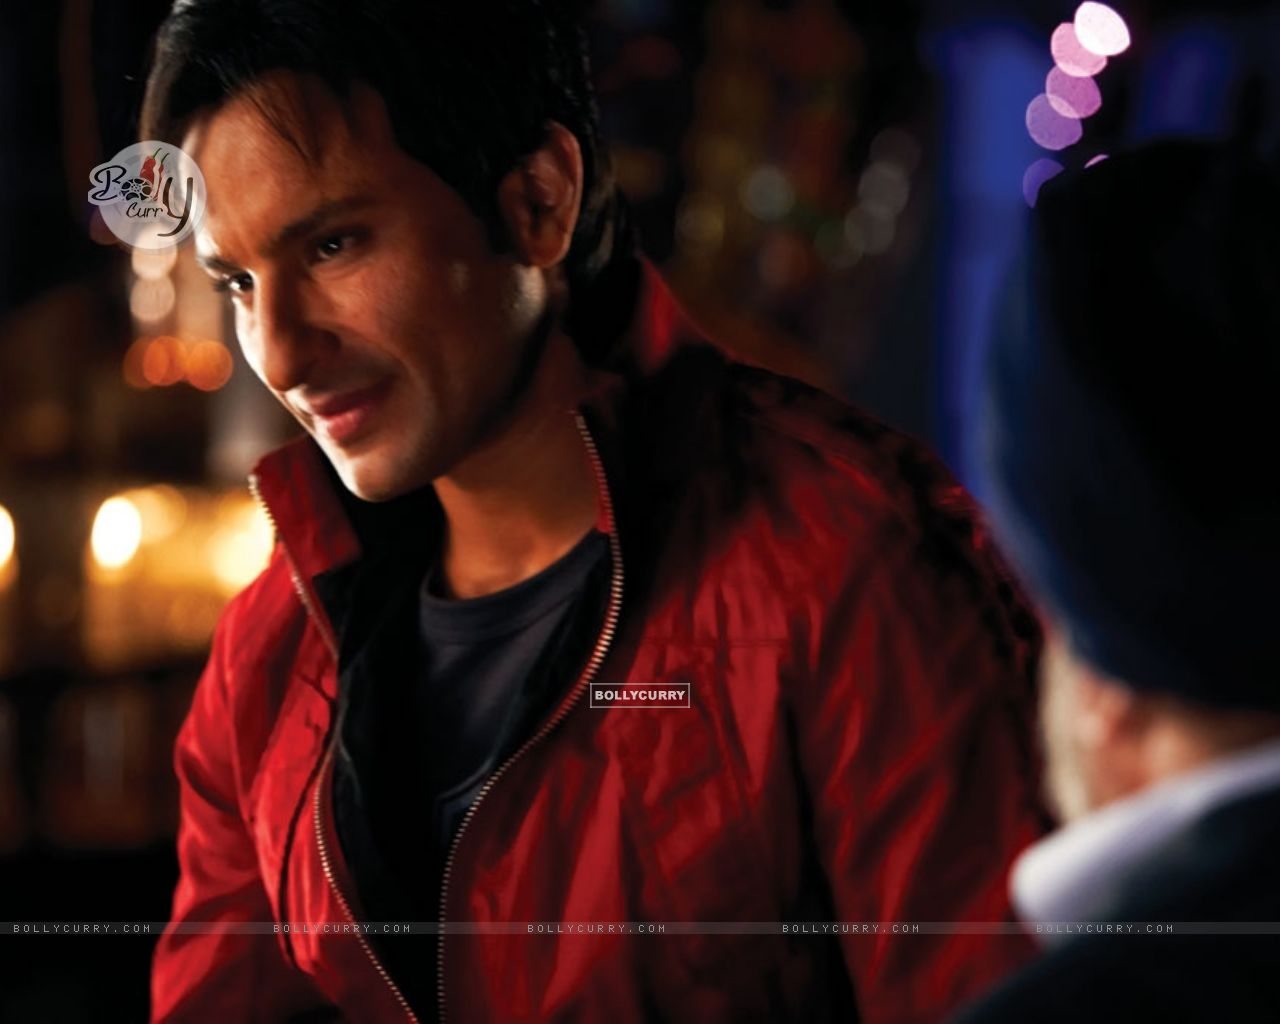 Saif Ali Khan in Red Jacket (11031) size:1280x1024